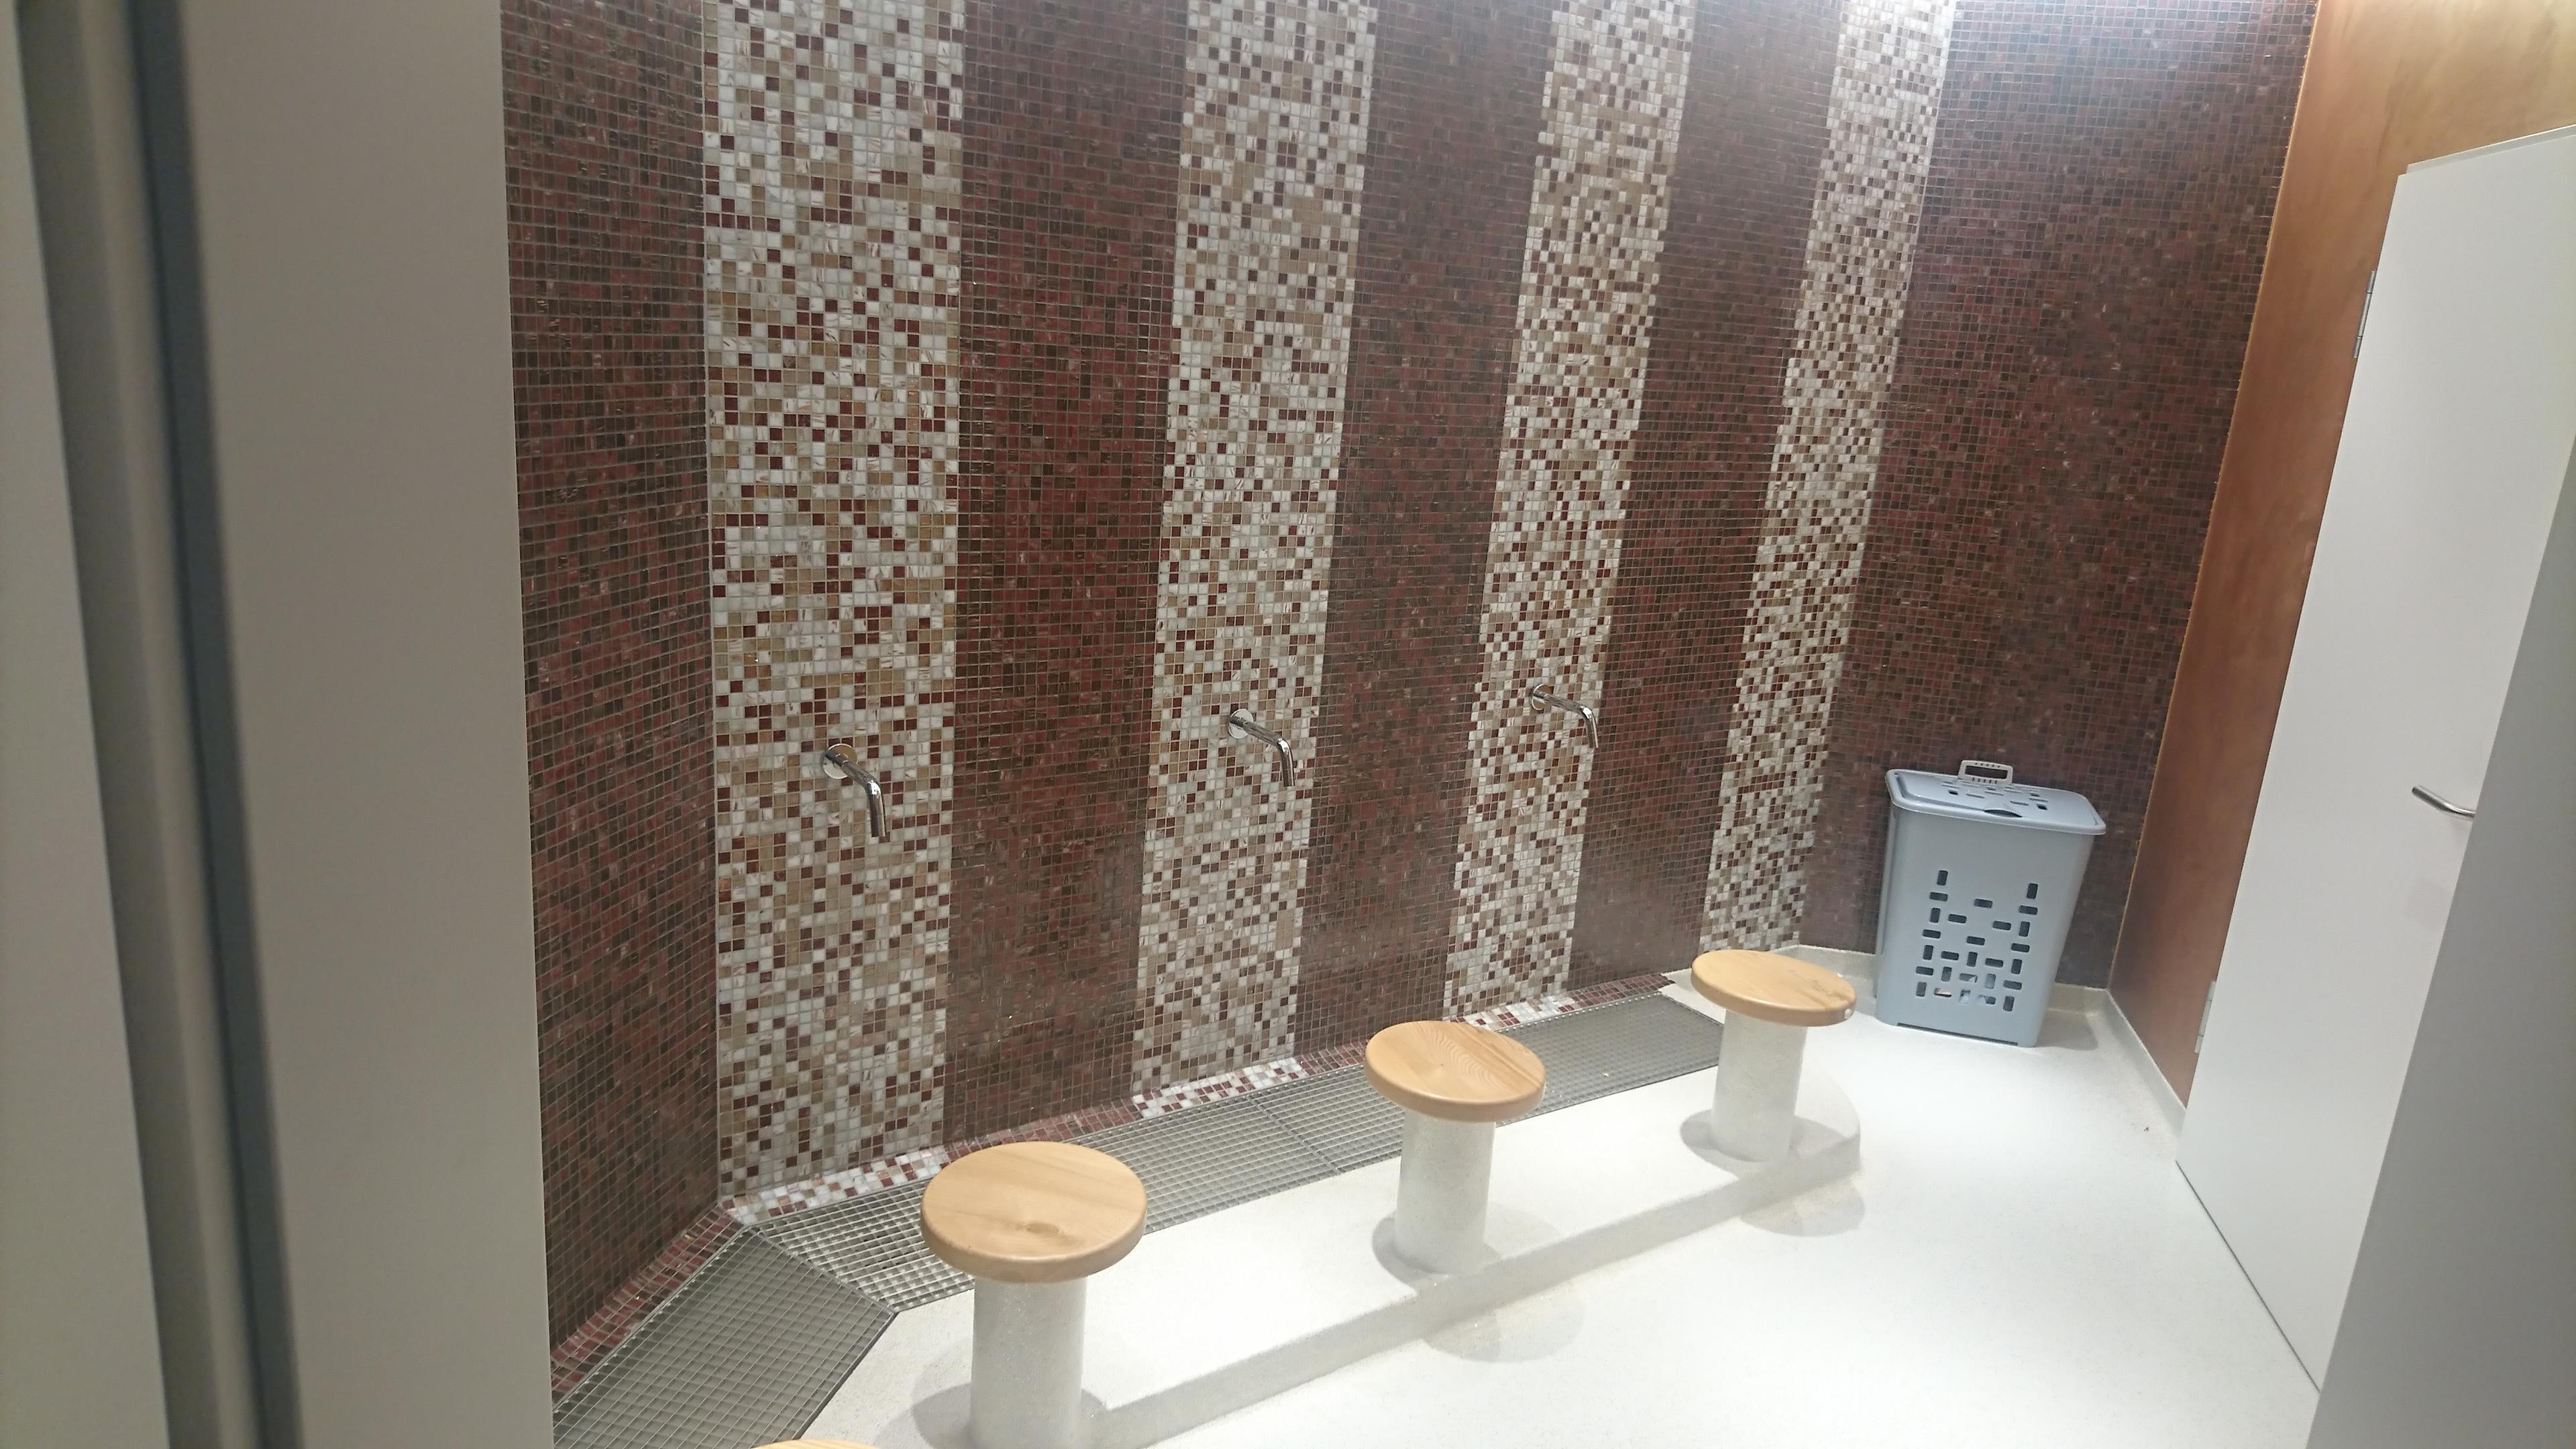 Wand: Mosaik 30x30 auf Netz